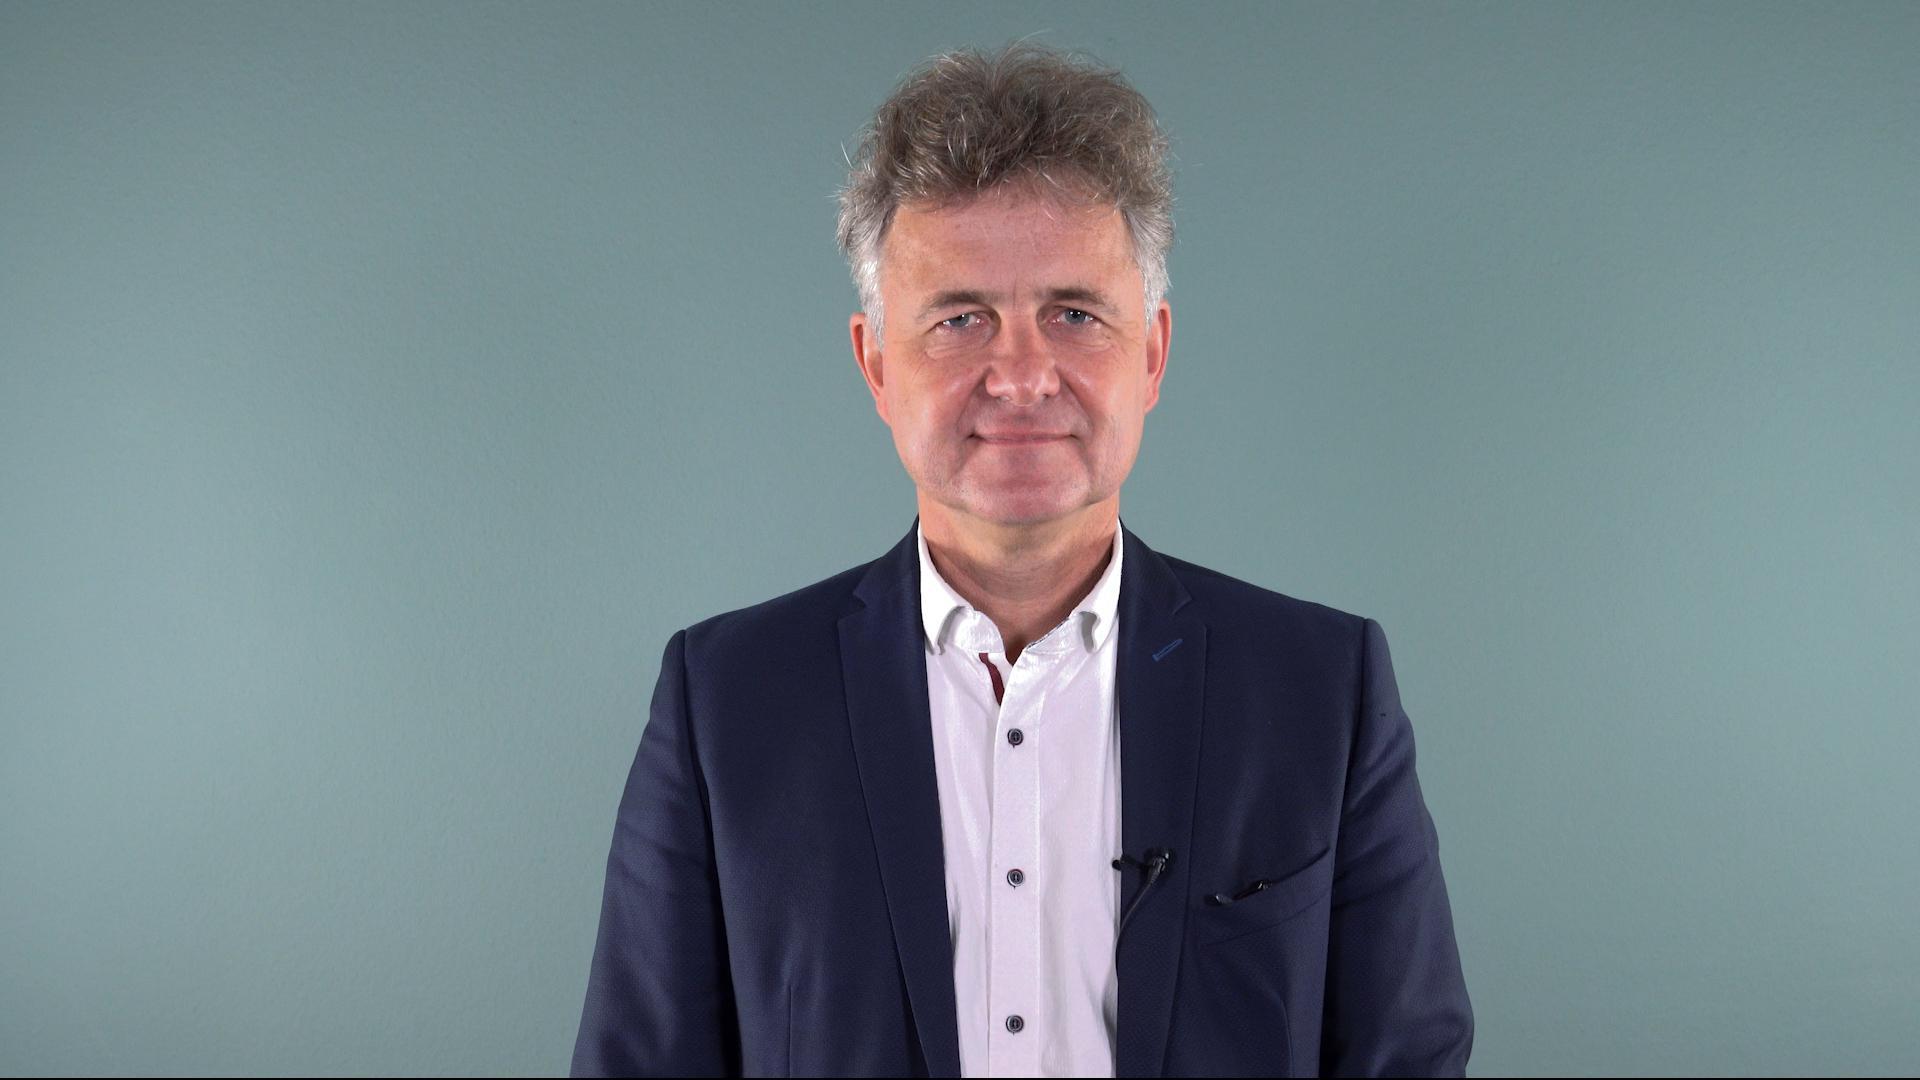 Frank Mentrup